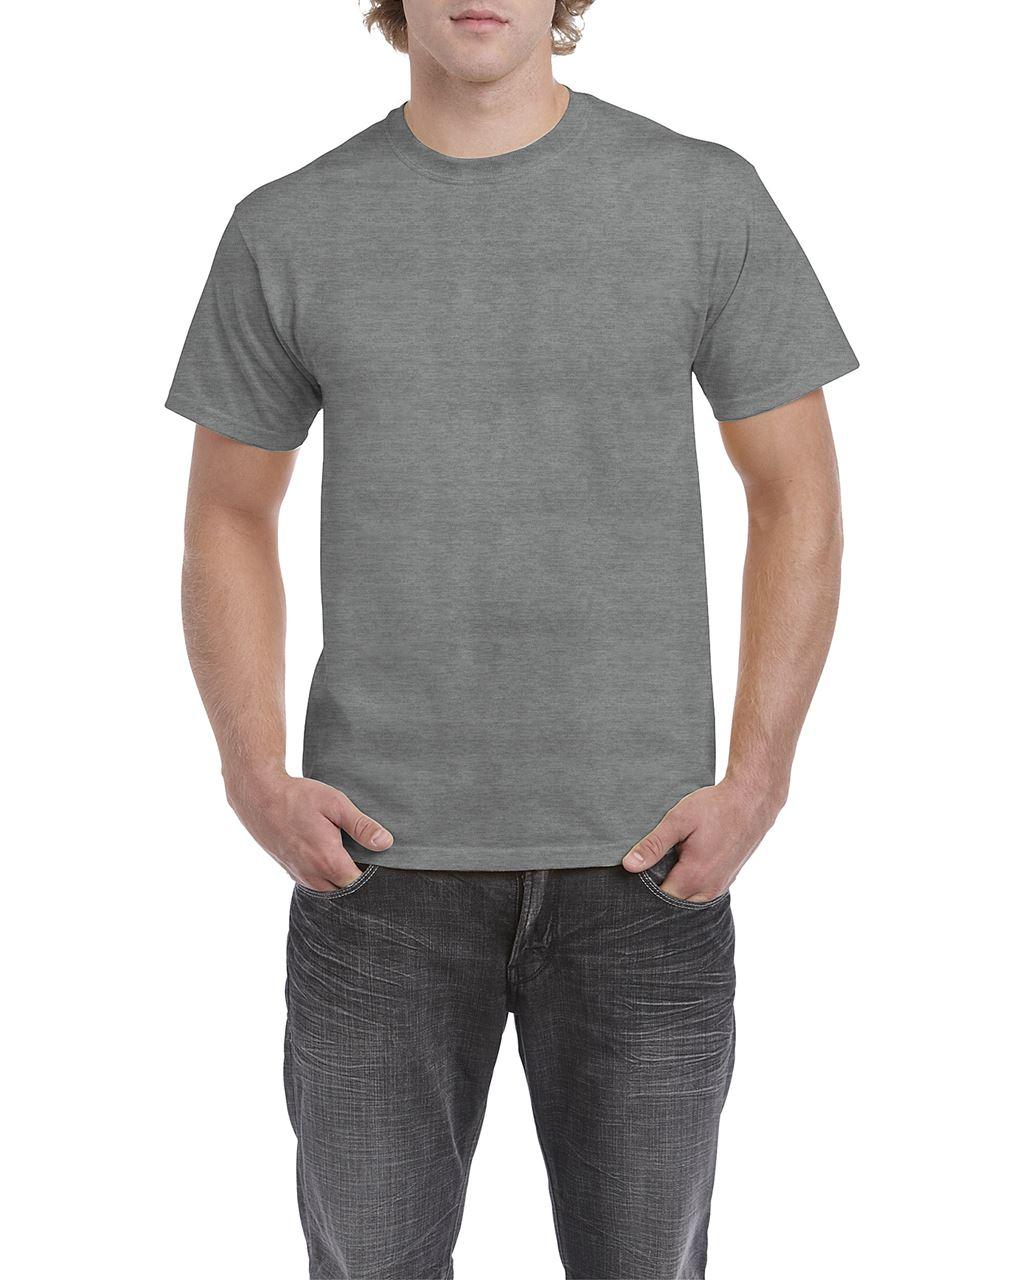 Tricou barbatesc Gildan Heavy Cotton bumbac 180 g/mp serigrafie termotransfer broderie DTG | Toroadv.ro